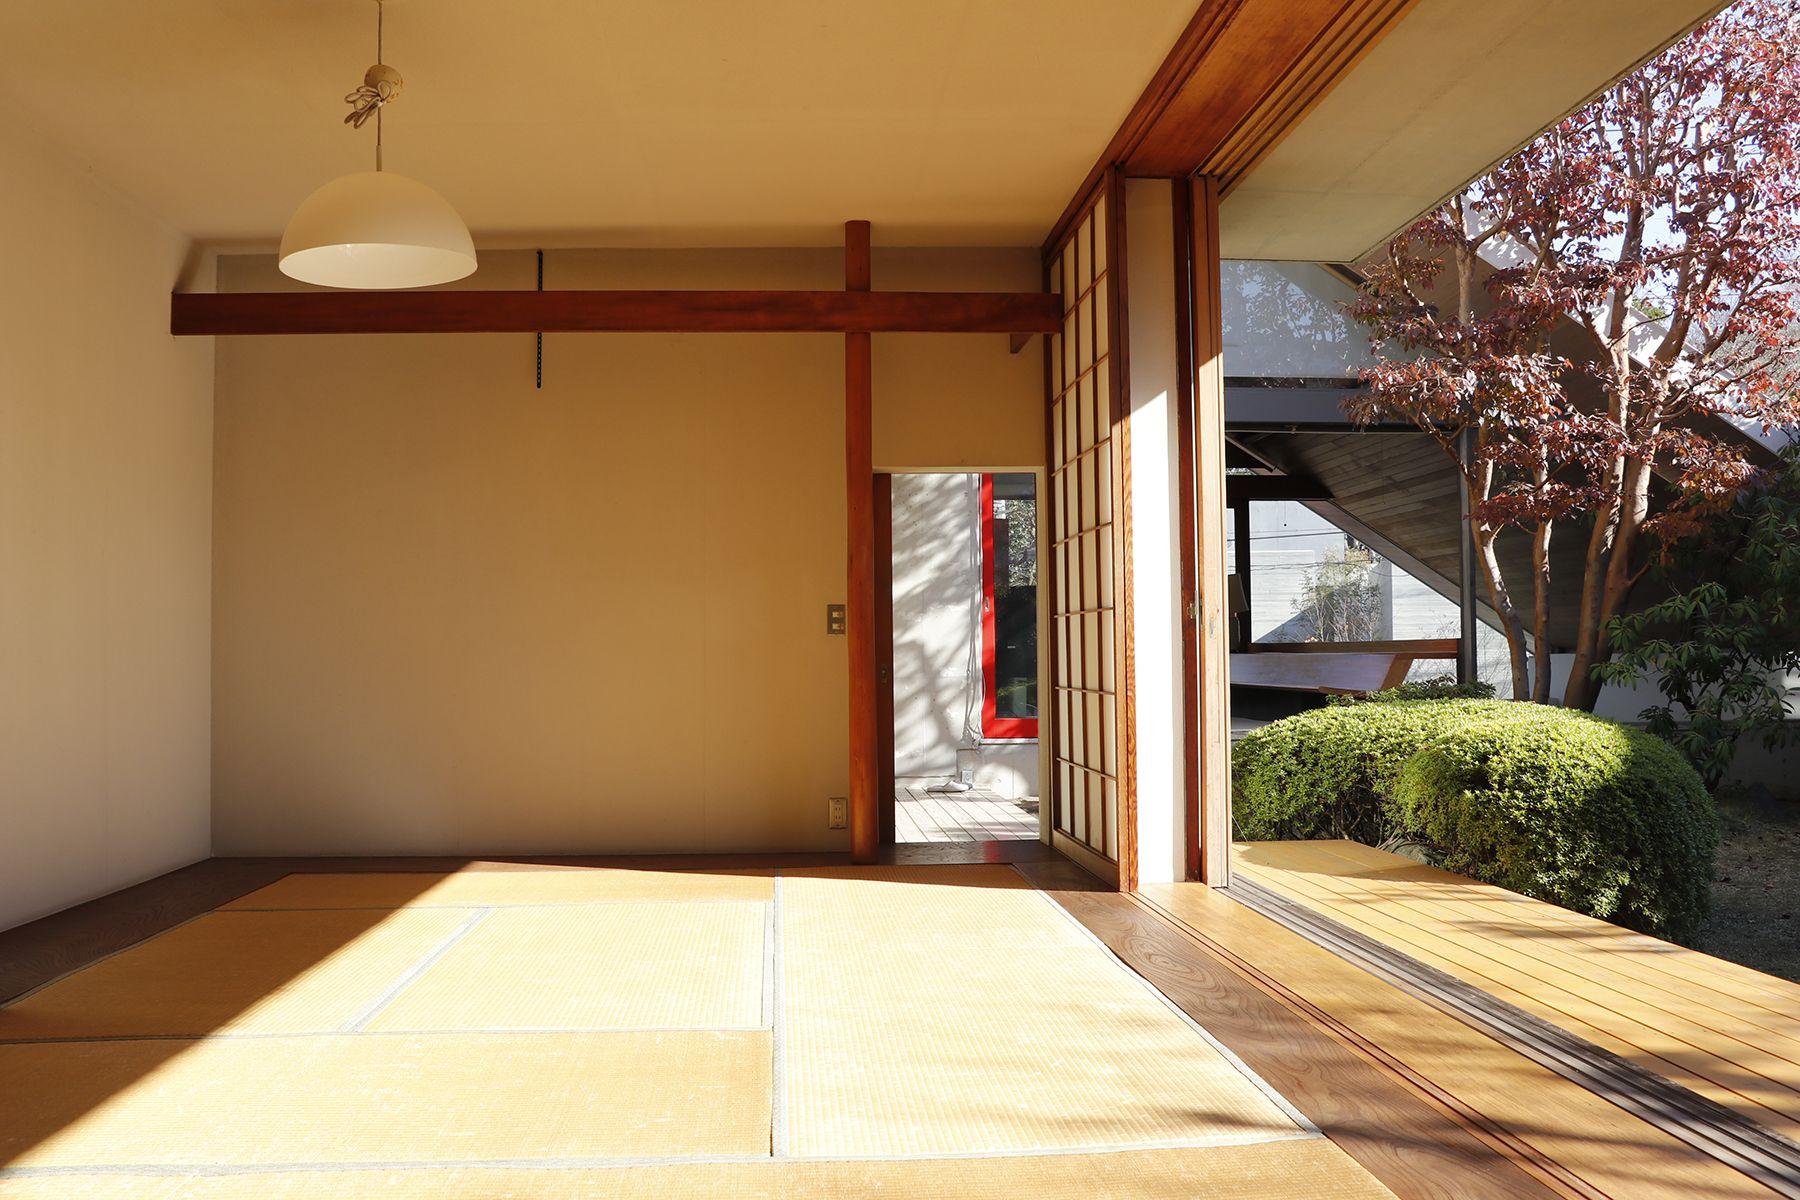 Arcstudio(アークスタジオ)和室 全景(入口側から)